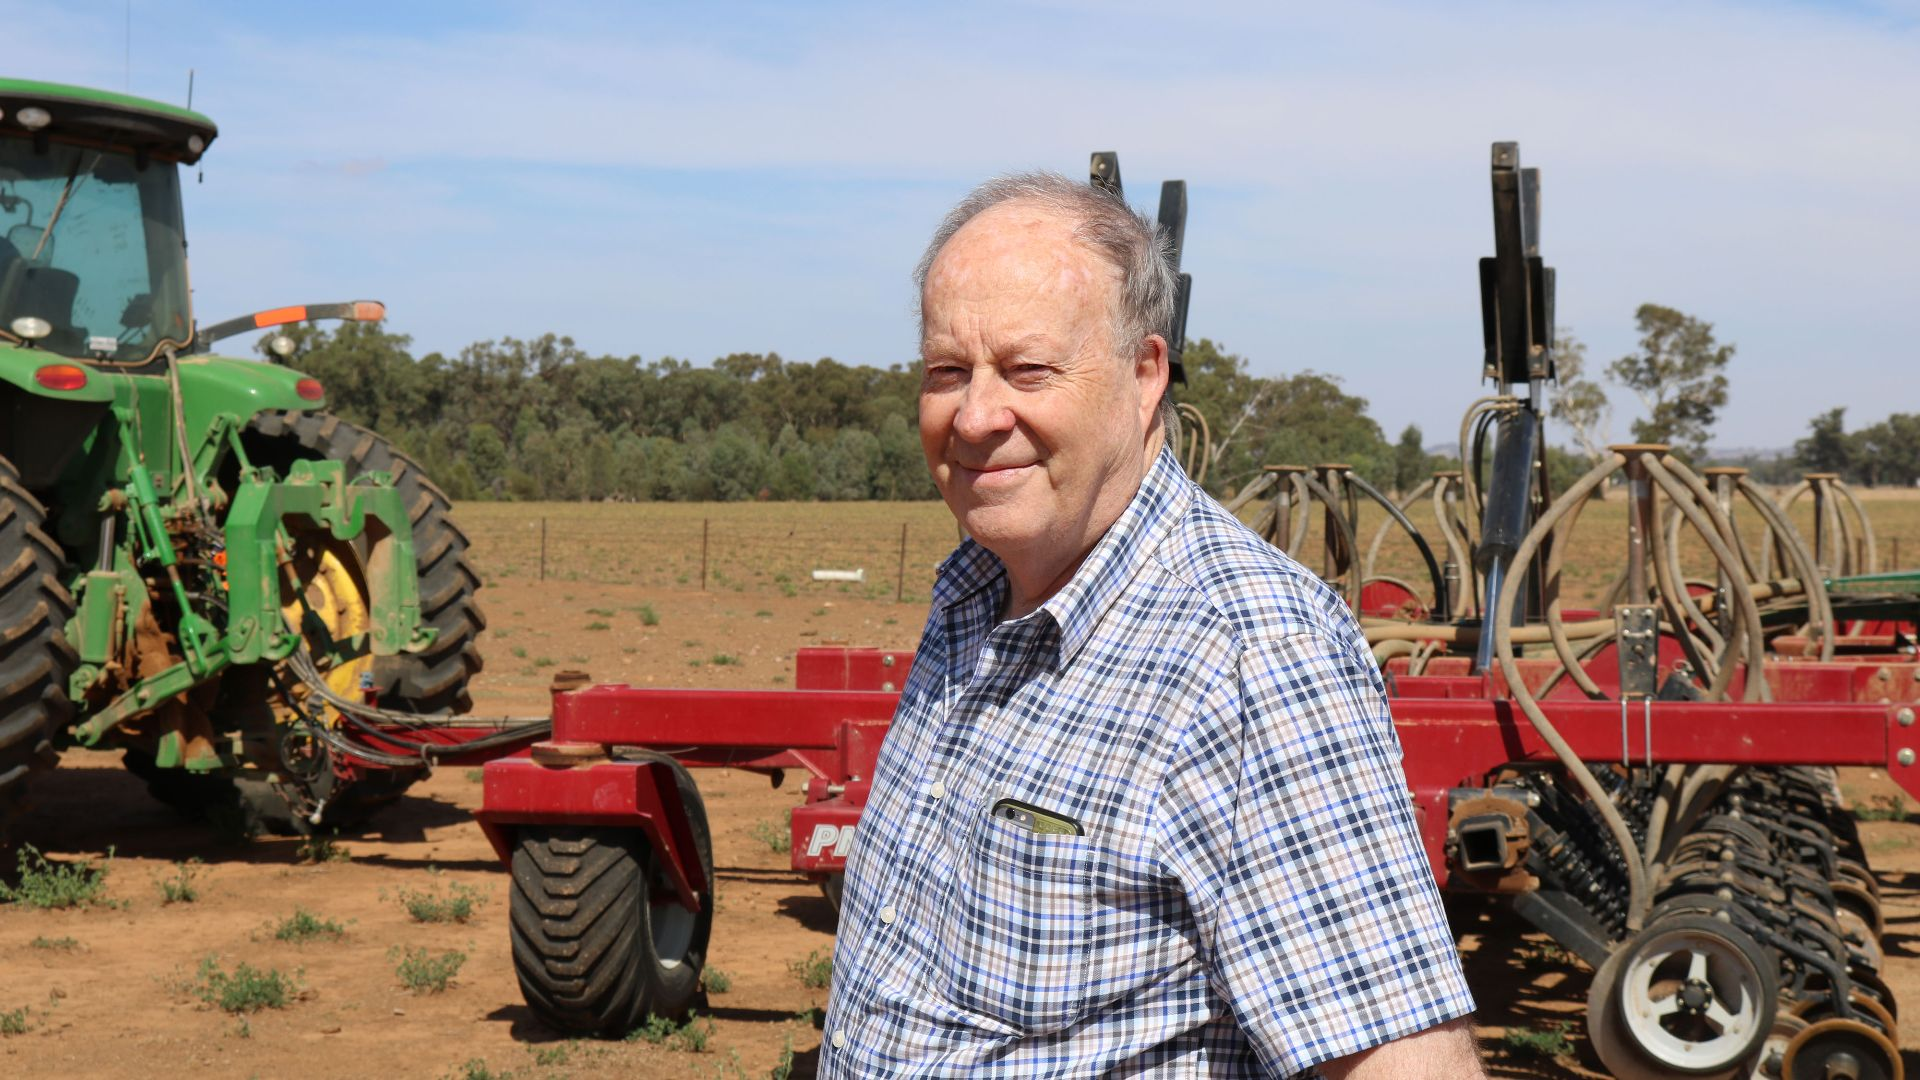 Australia no longer needs a ban on genetically modified crops